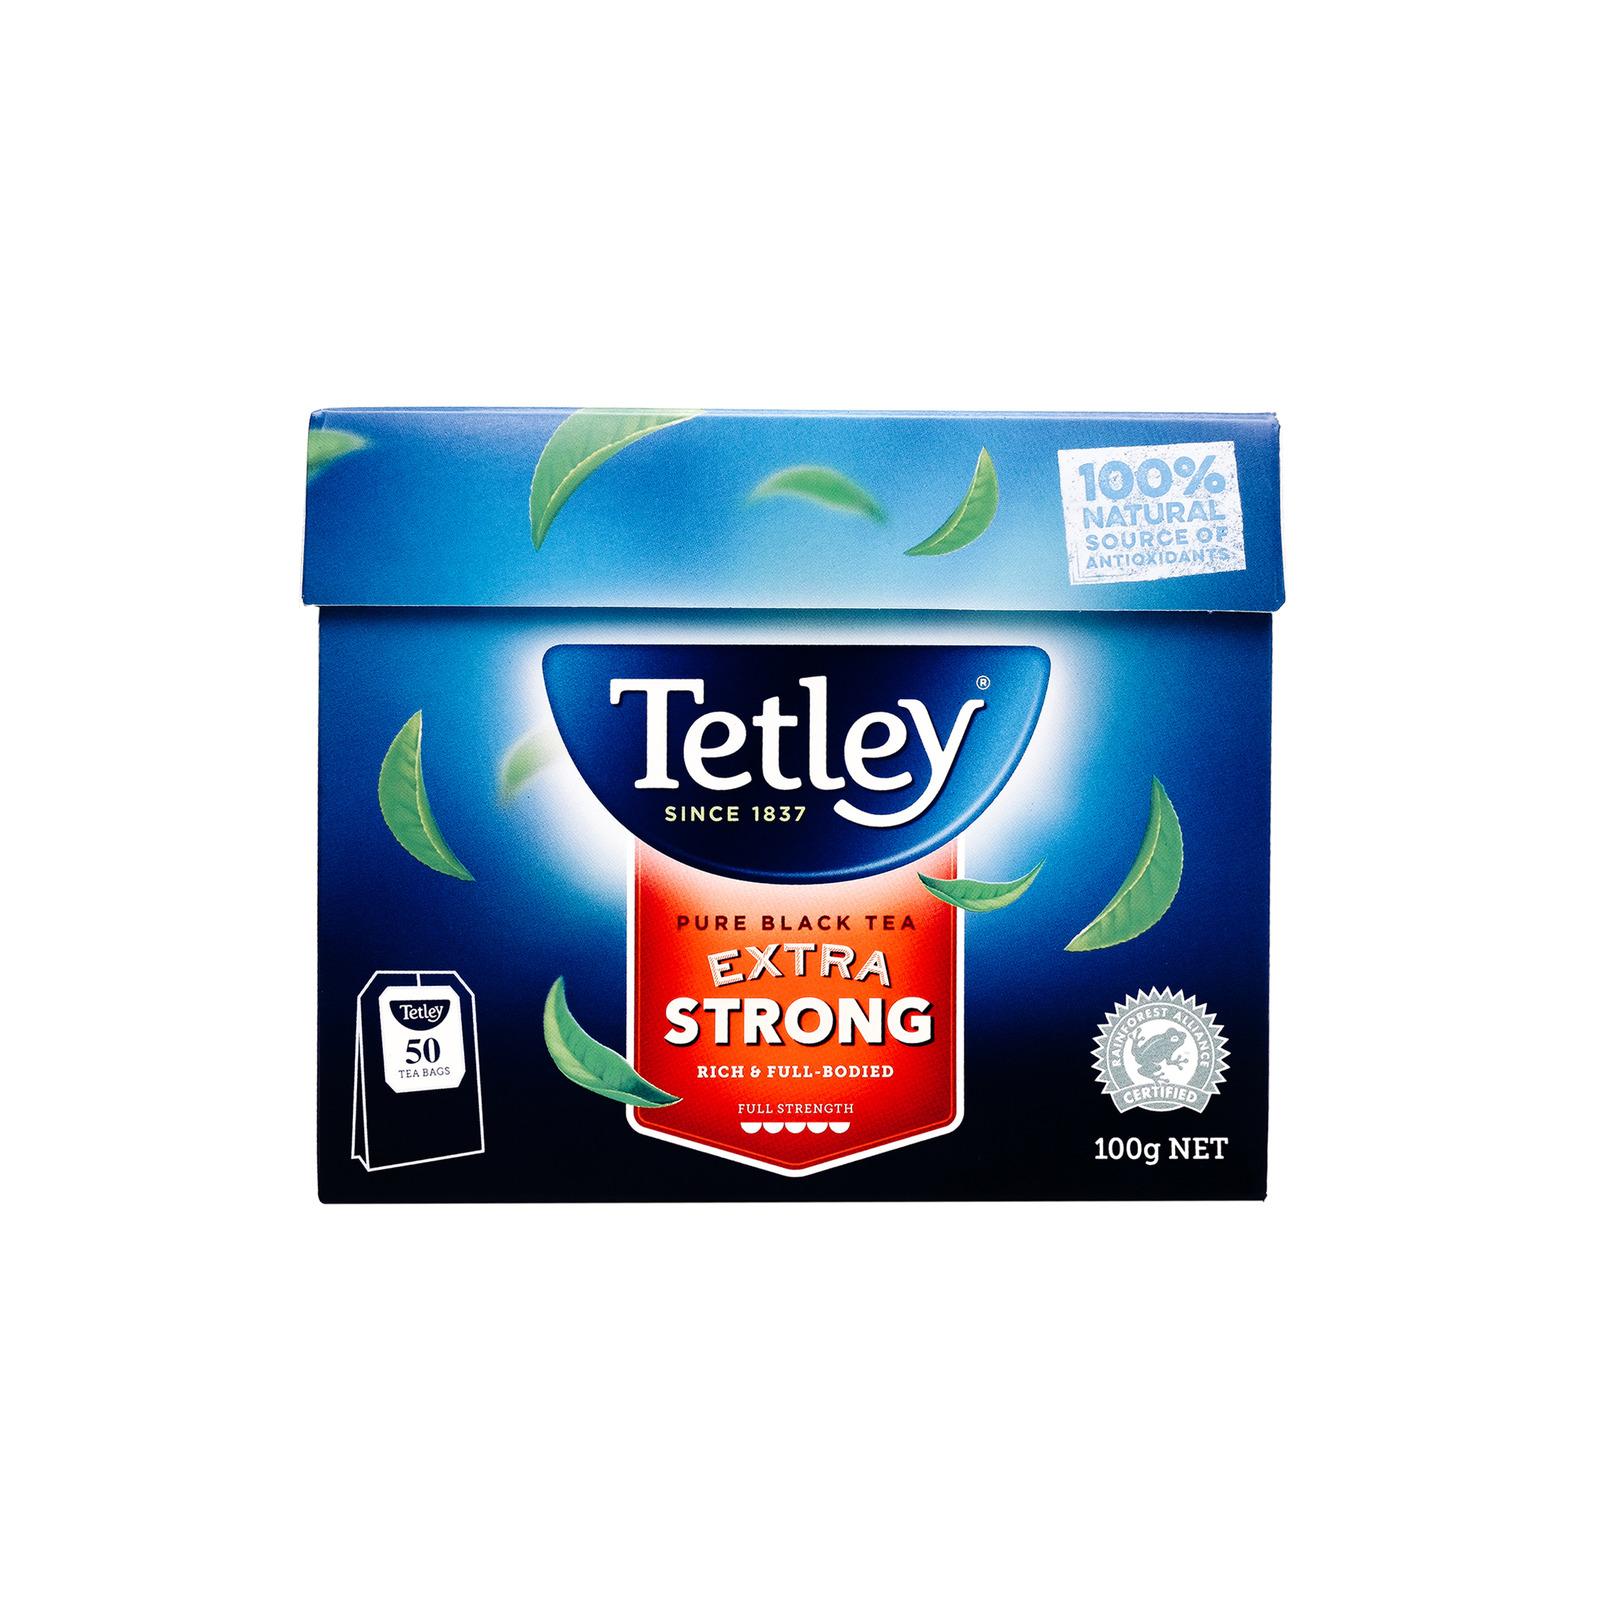 Tetley Australia Pure Black Tea Extra Strong 50s - By Sonnamera